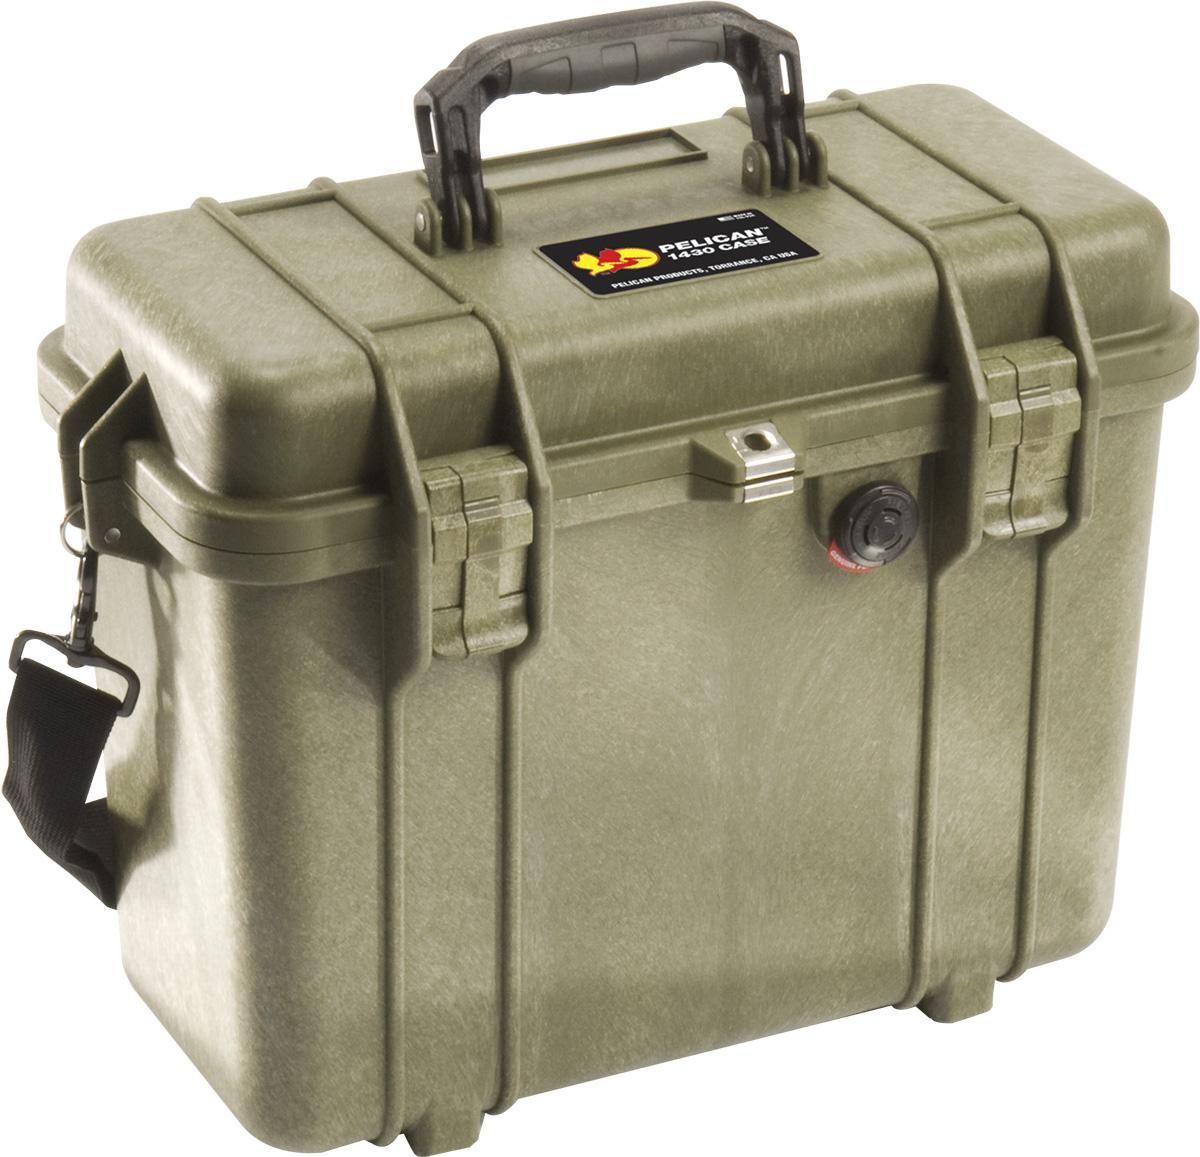 pelican 1430 protector case green top